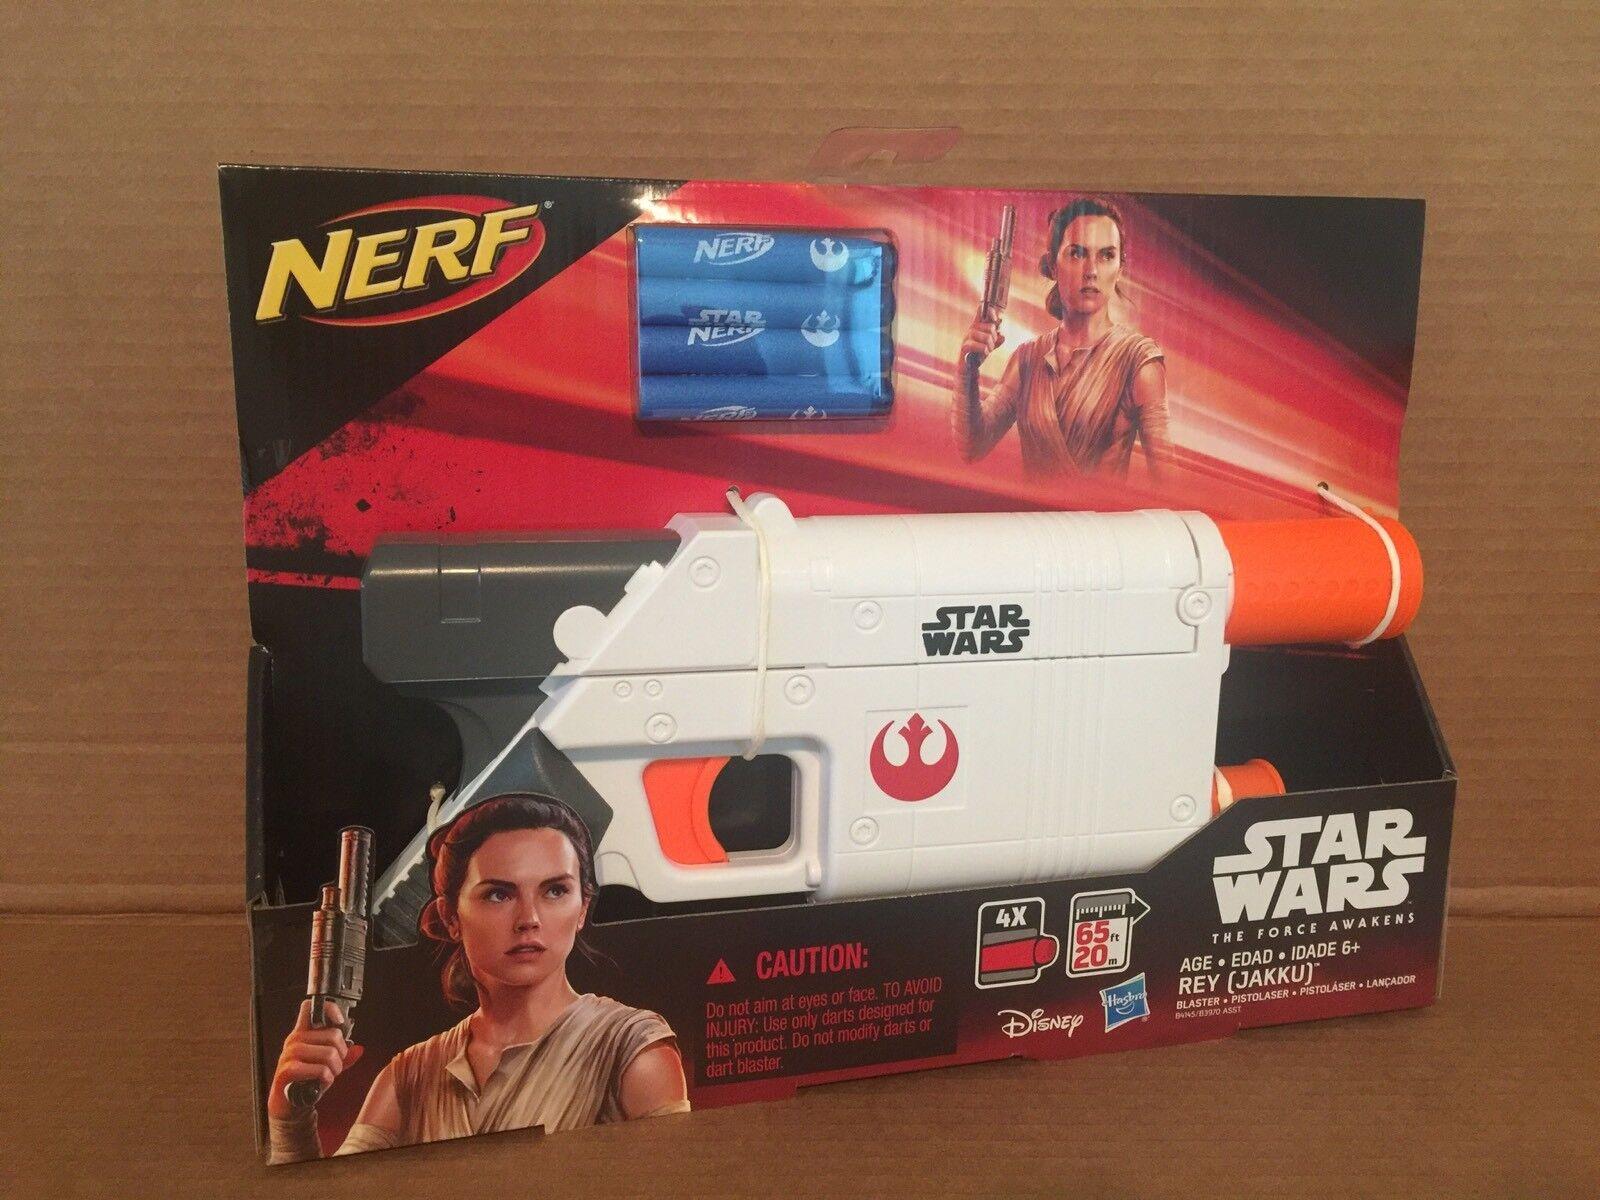 Nerf Star Wars E7 E7 E7 Rey (Jukko)blaster edf0fc